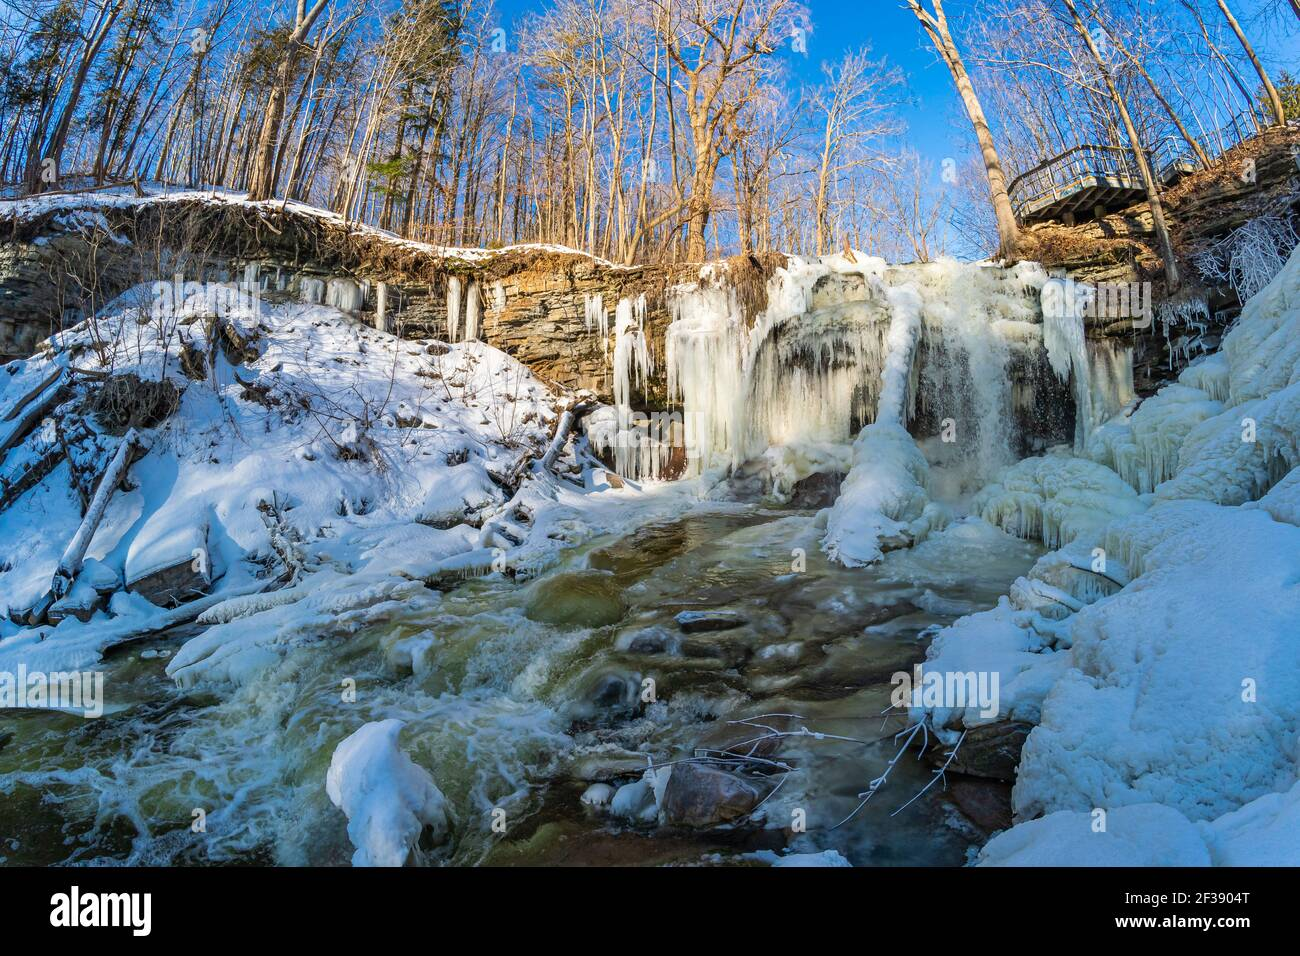 Smokey Hollow Waterfalls Ancaster Hamilton Ontario Canada in winter Stock Photo